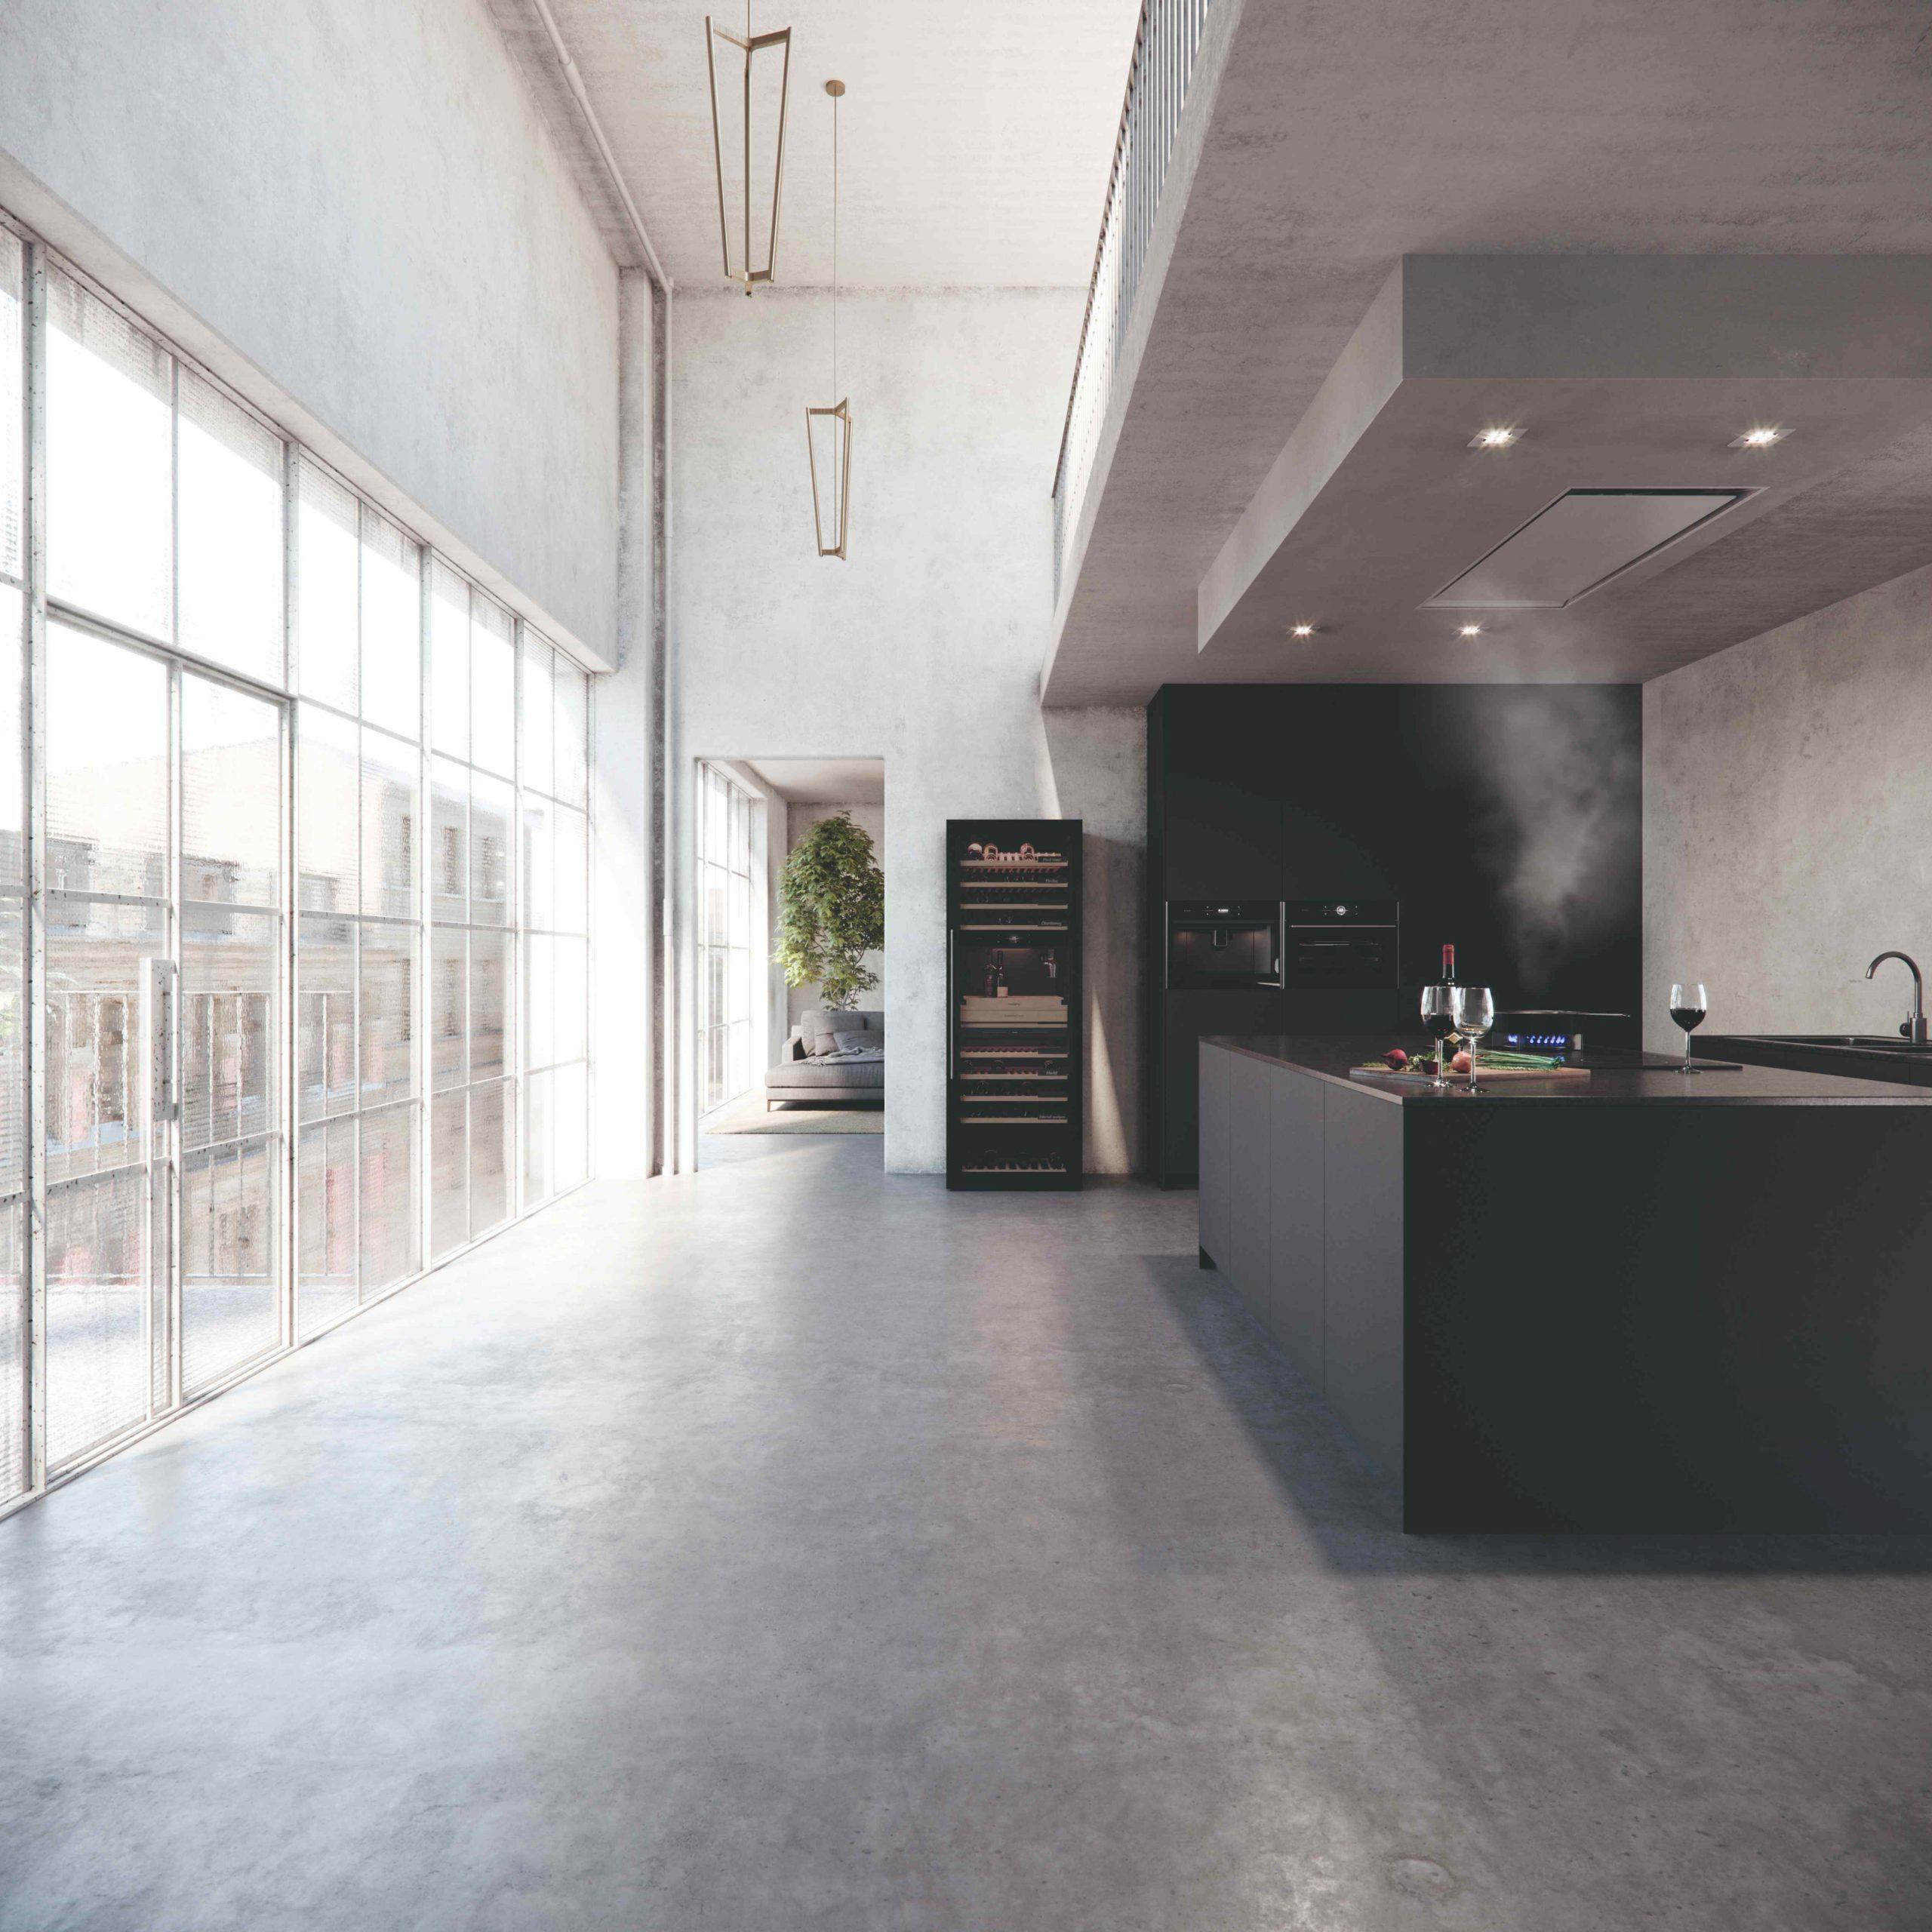 Inteligentná vinotéka v modernej kuchyni